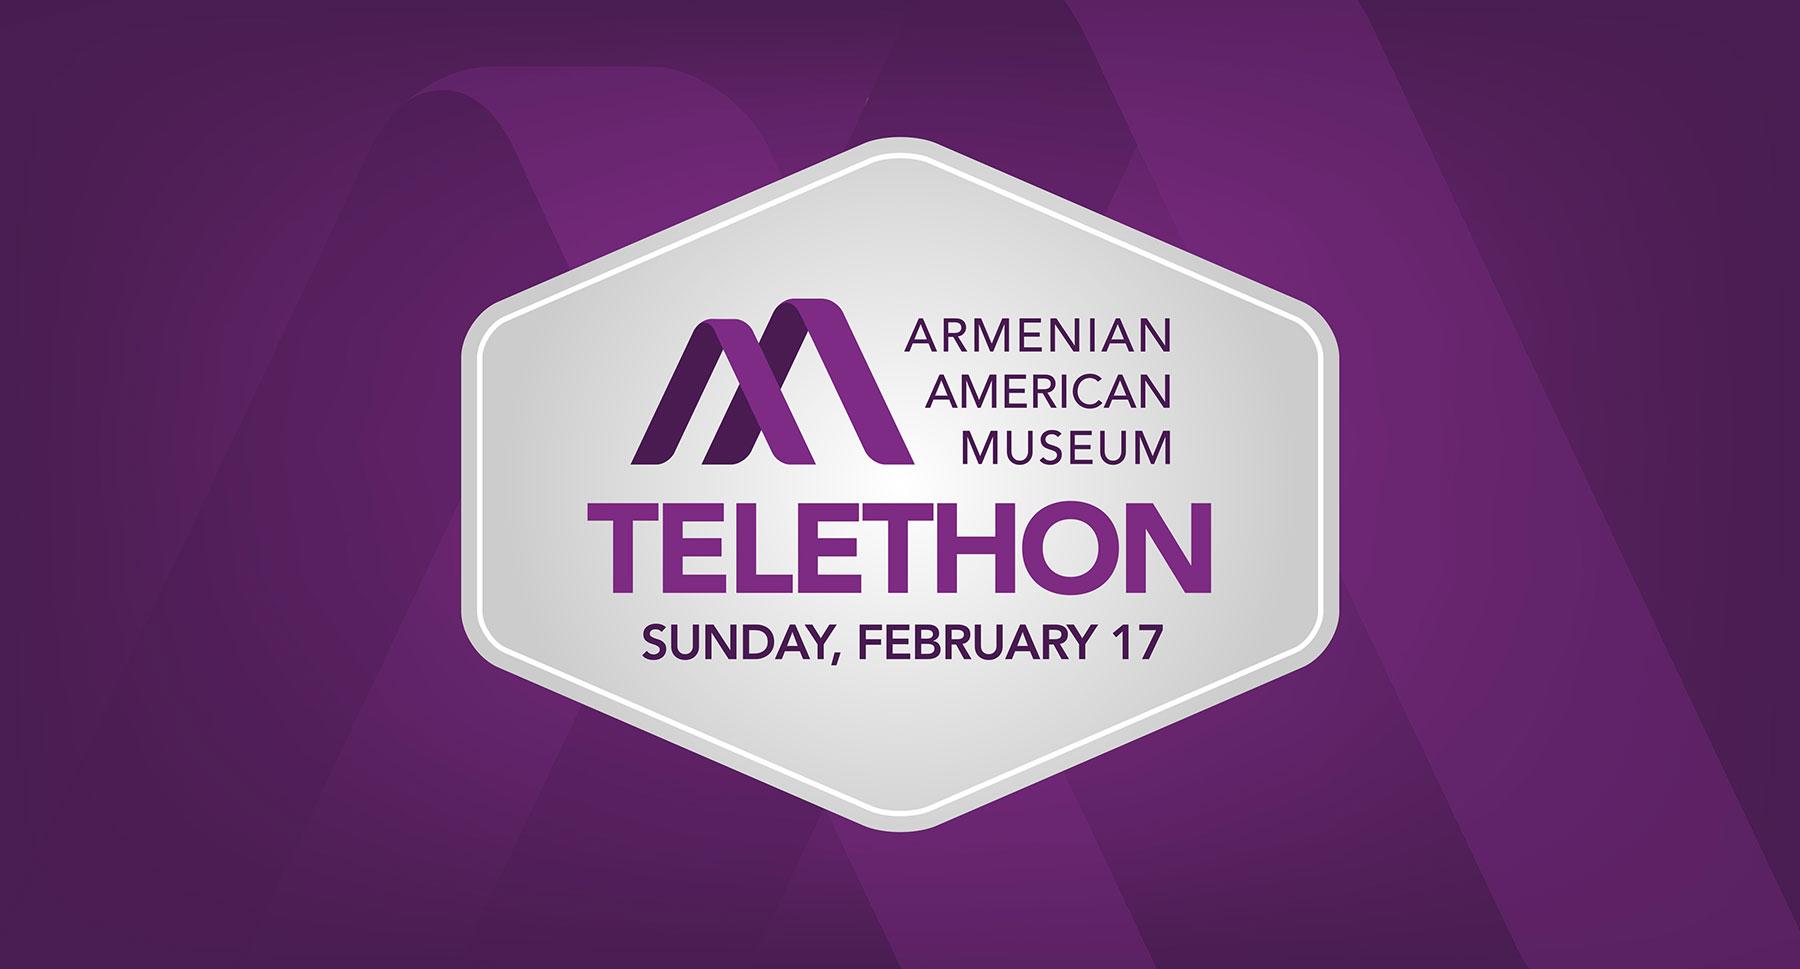 Armenian American Museum Announces Telethon on February 17